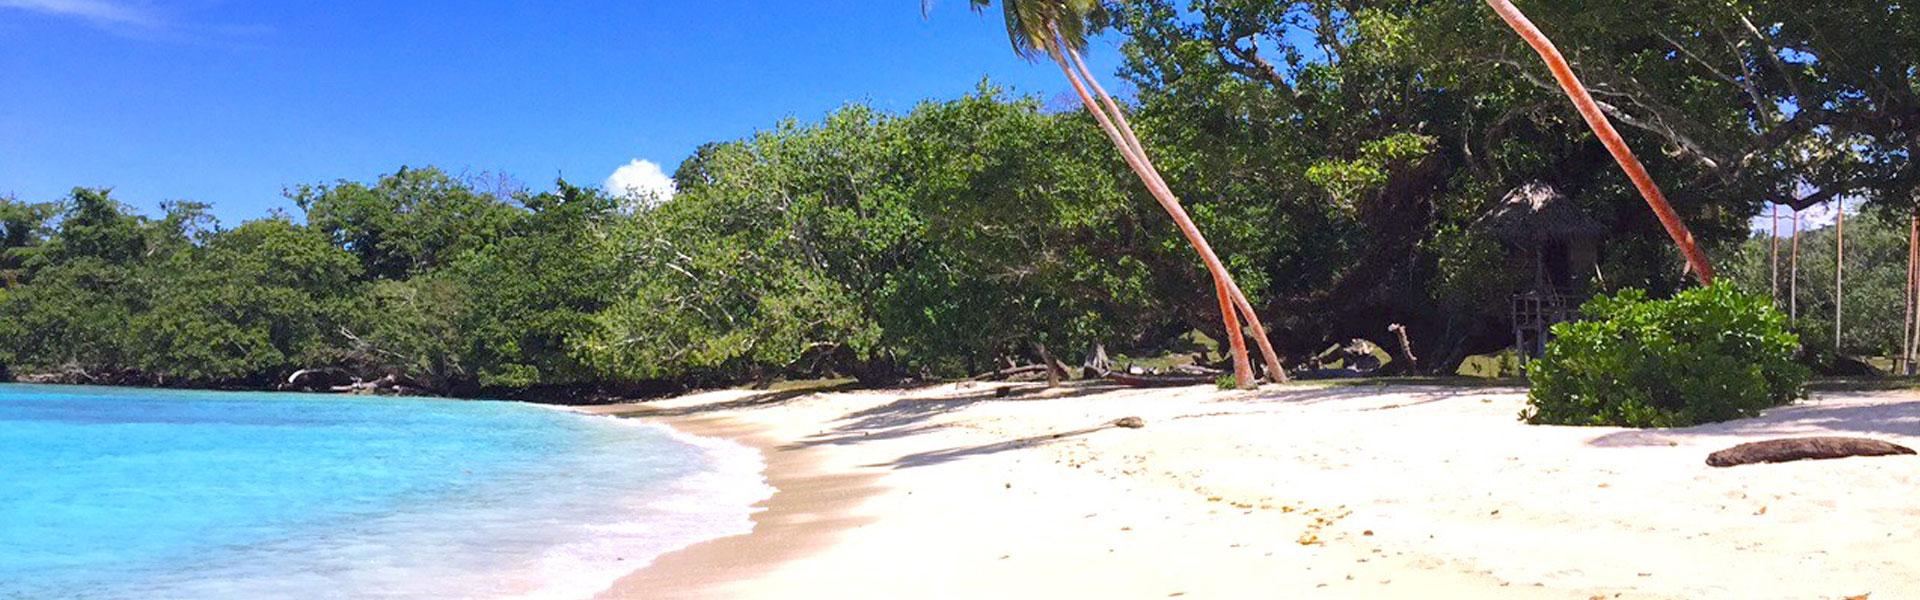 danyisland-beach